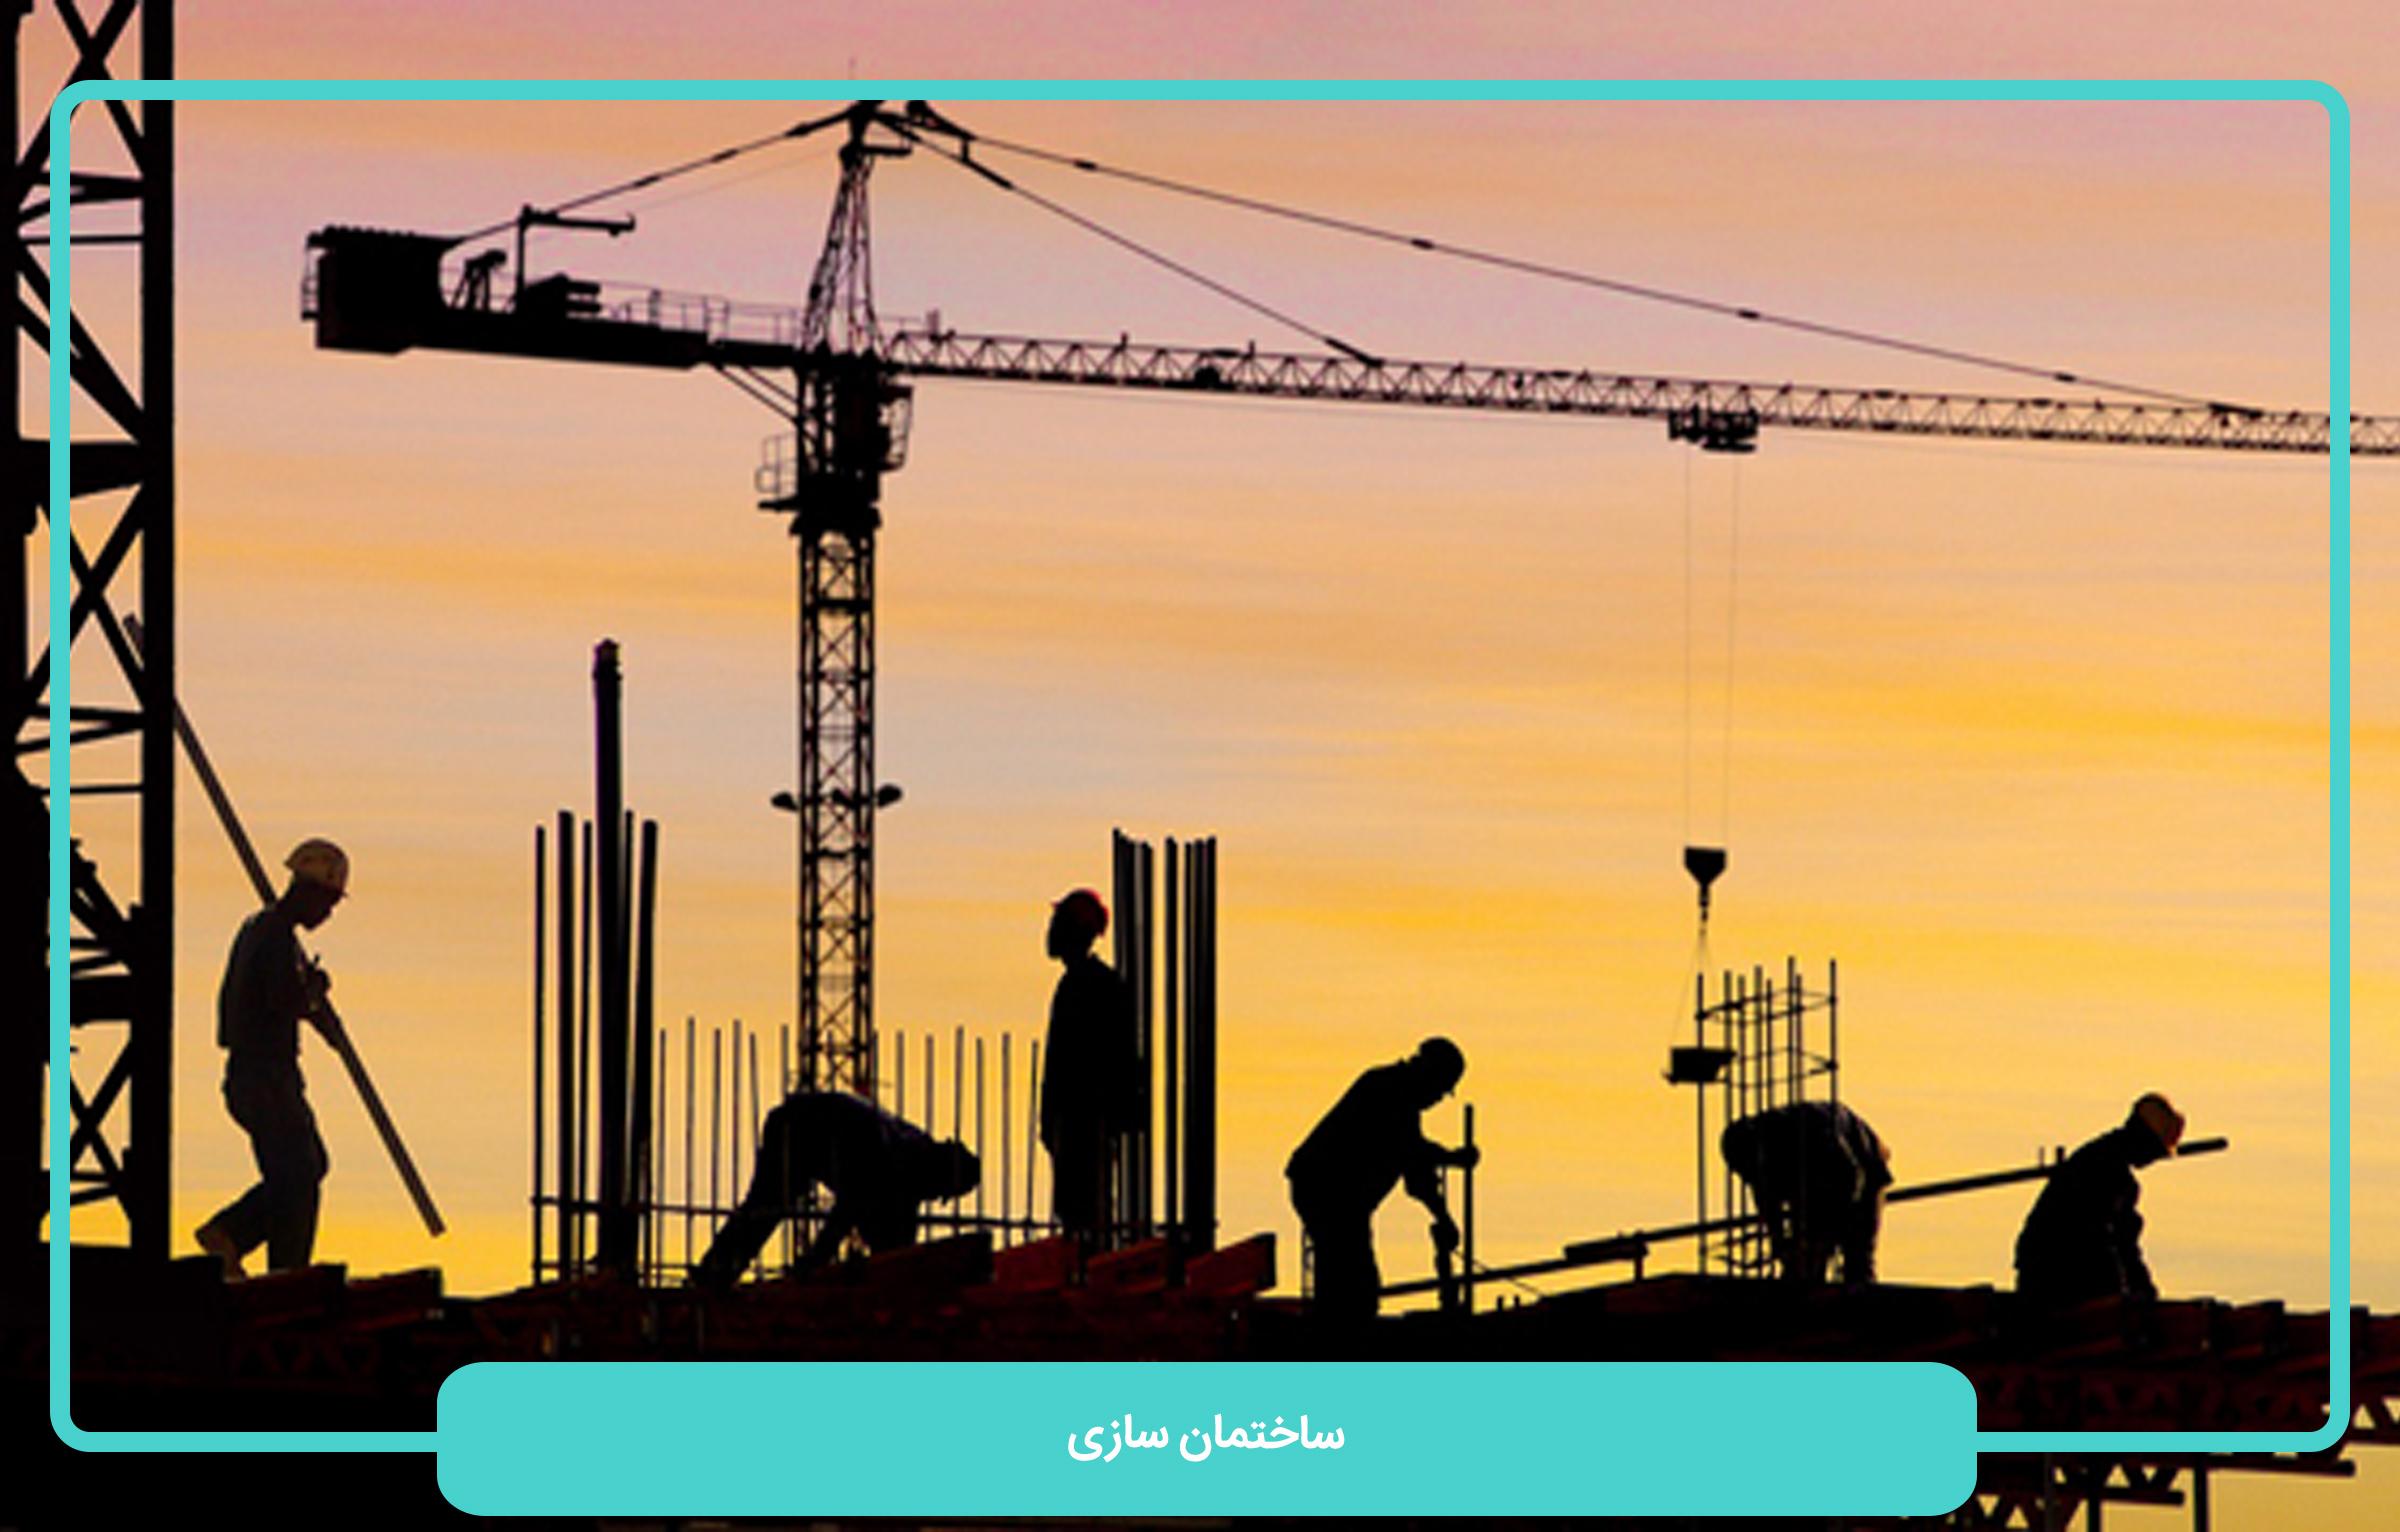 ساختِ ساختمان